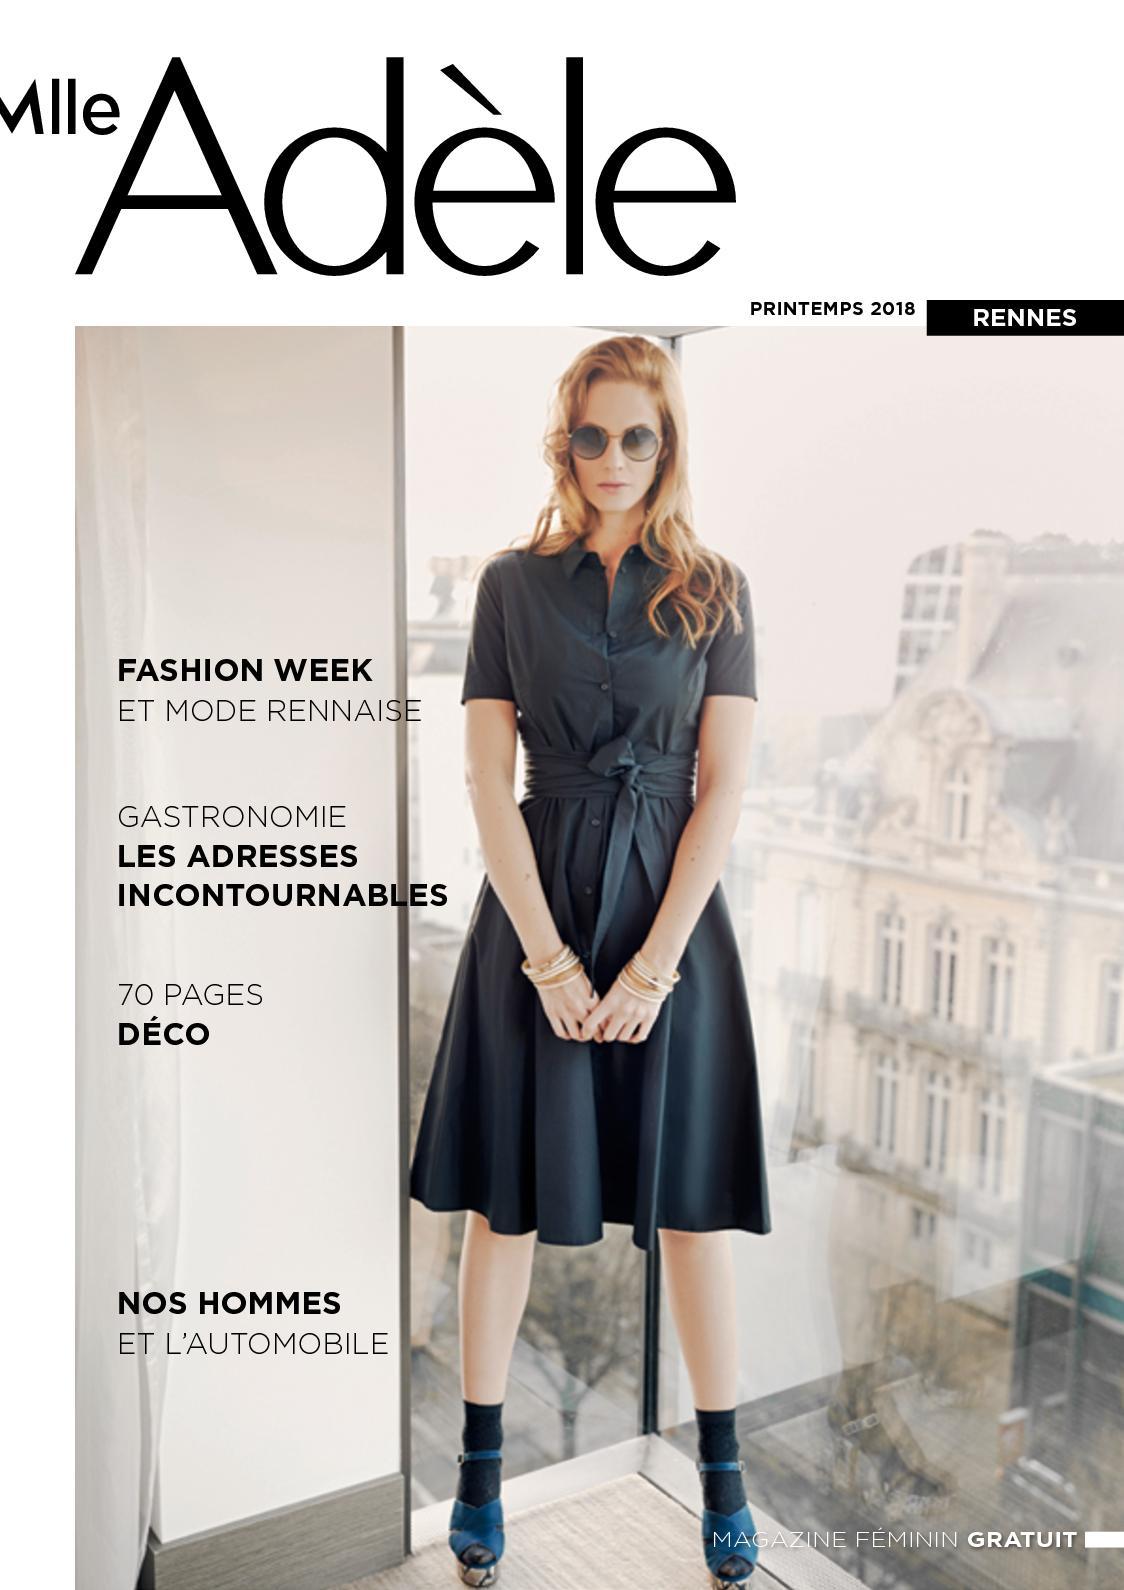 L Ancrage maritime serviette tendance Fashion Foulard écharpe Marine Blanc Style